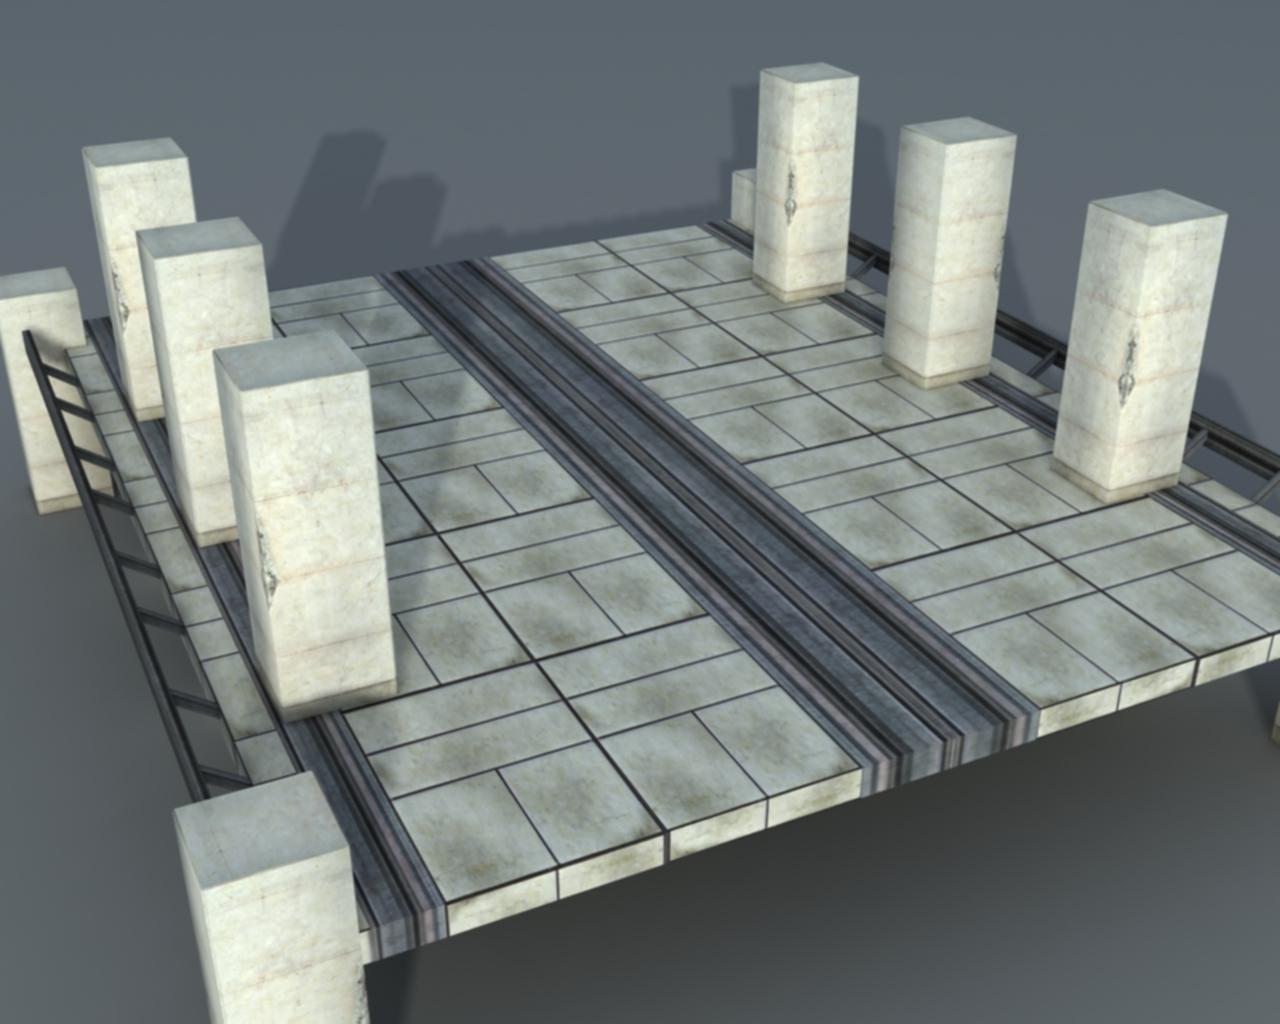 Bridge sci-fi - 3DOcean Item for Sale